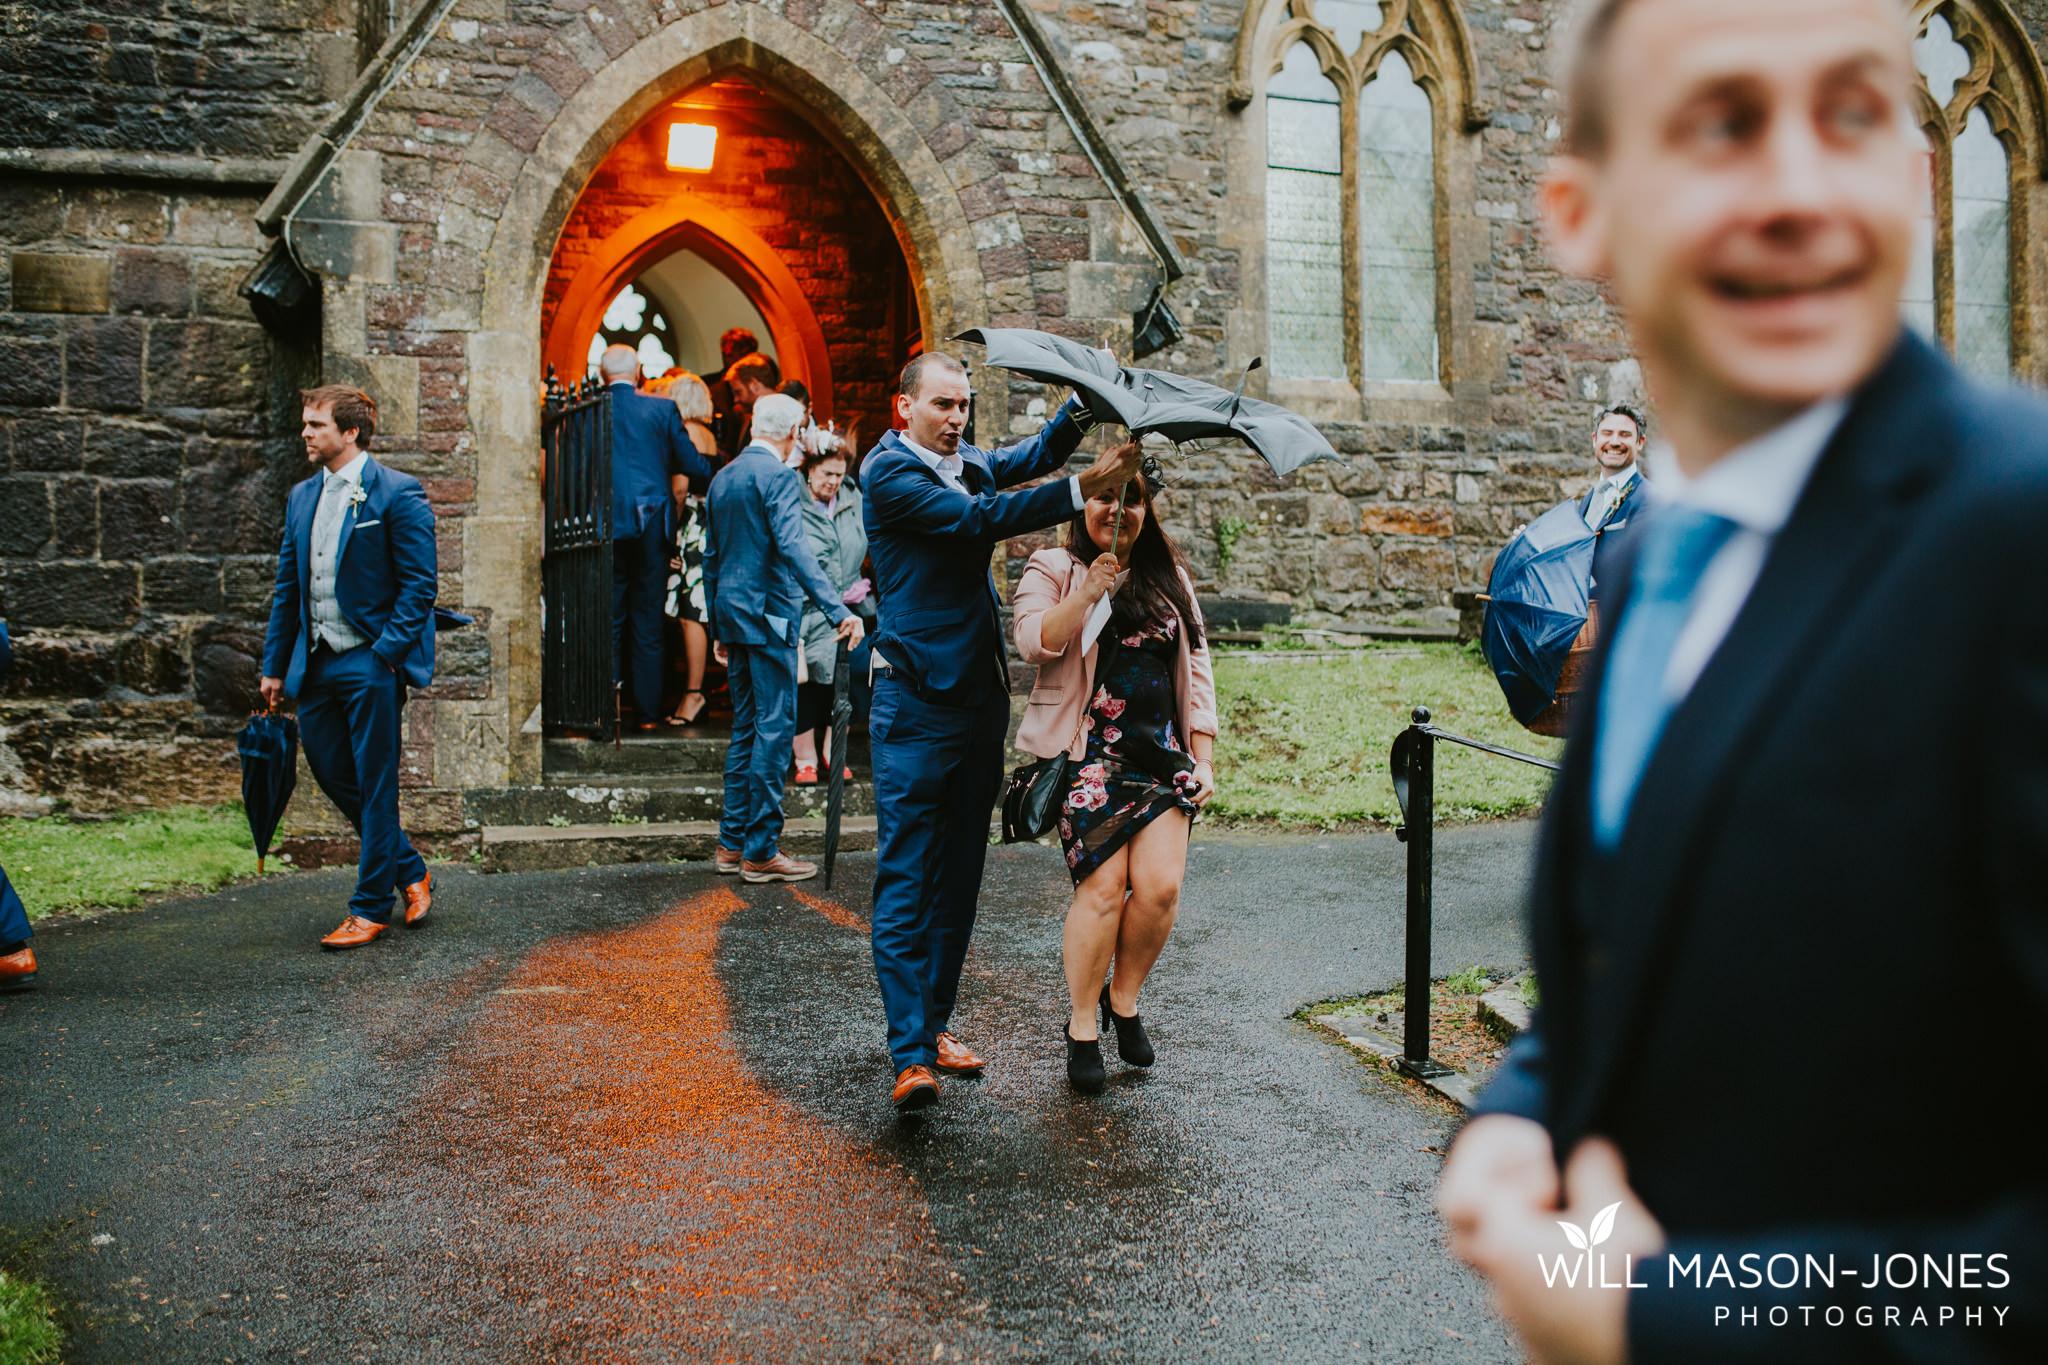 rainy-wet-llandybie-church-wedding-ceremony-swansea-photographers-14.jpg